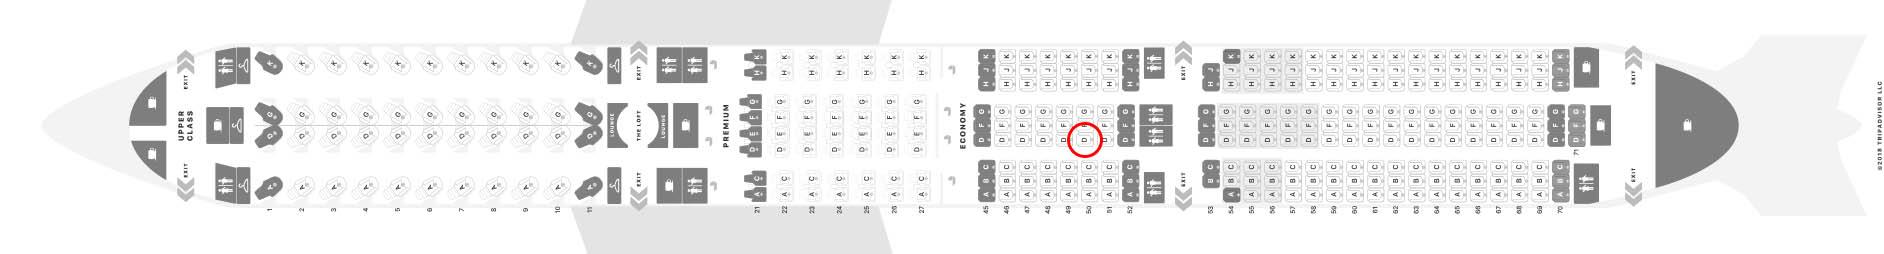 Virgin Atlantic a350-1000 seat map